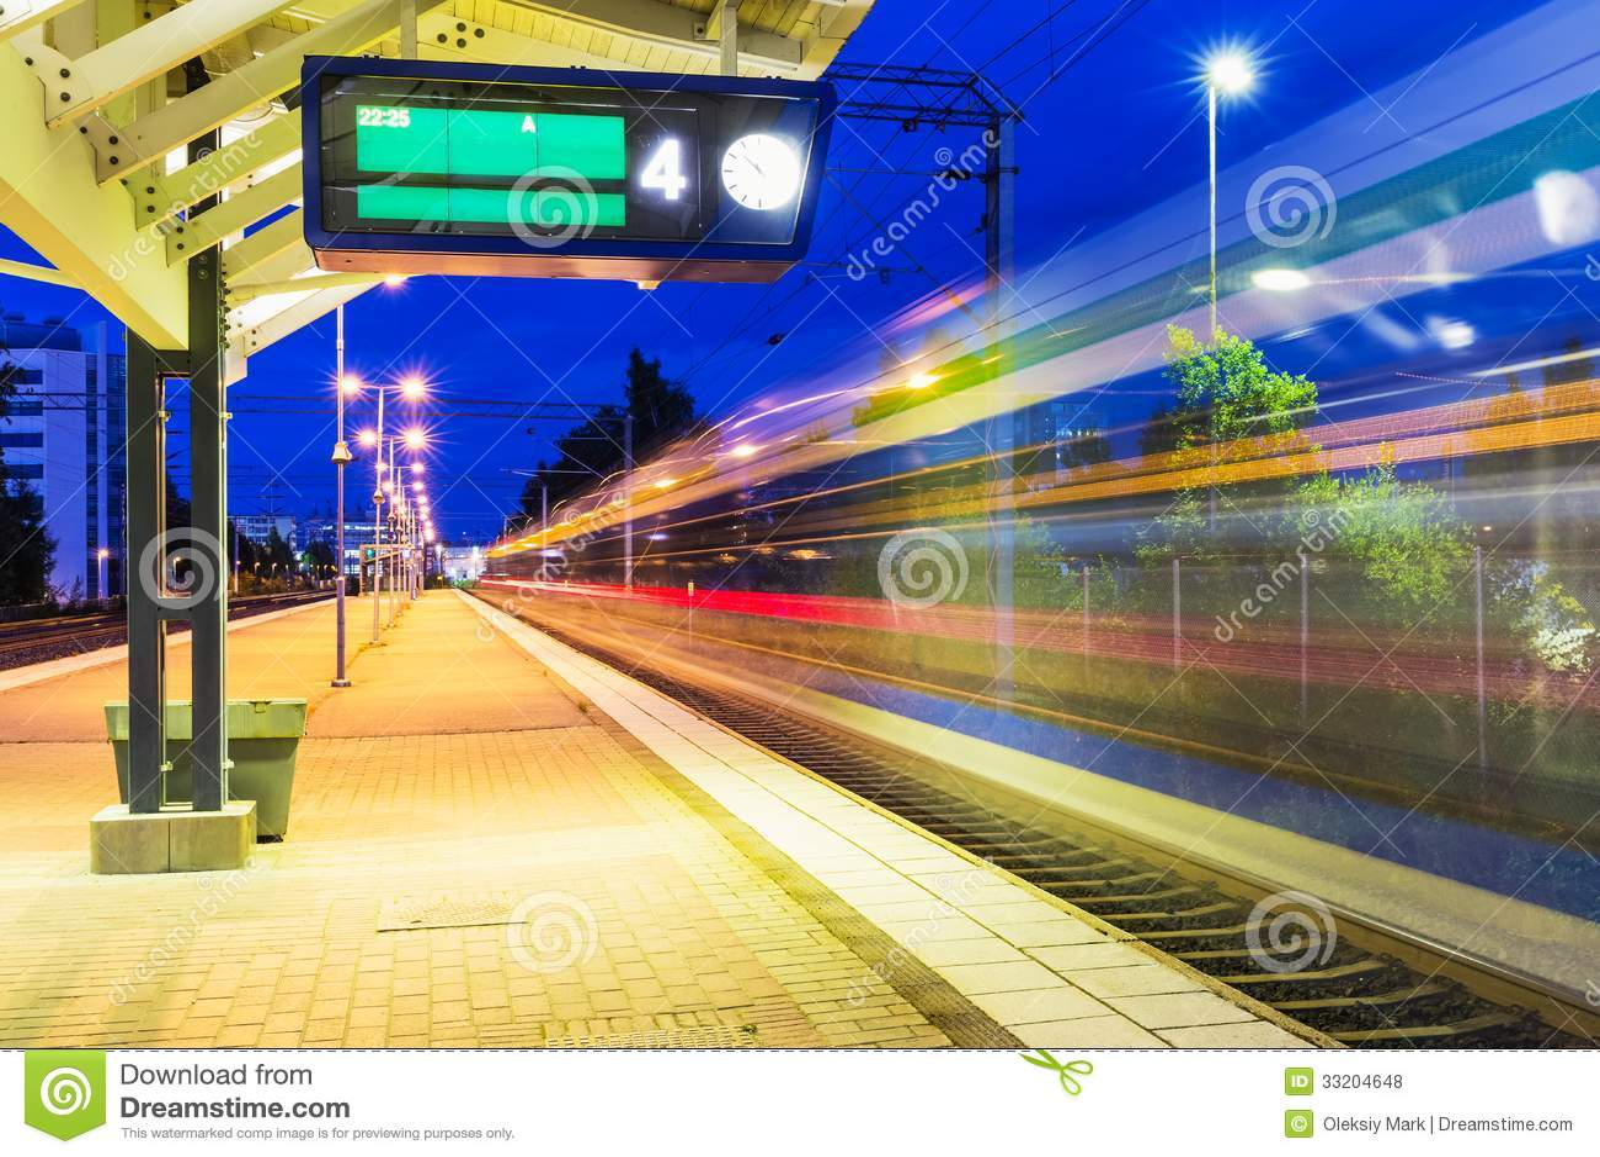 railway infrastructure spending market Research and markets: railway infrastructure spending market in china 2015-2019.